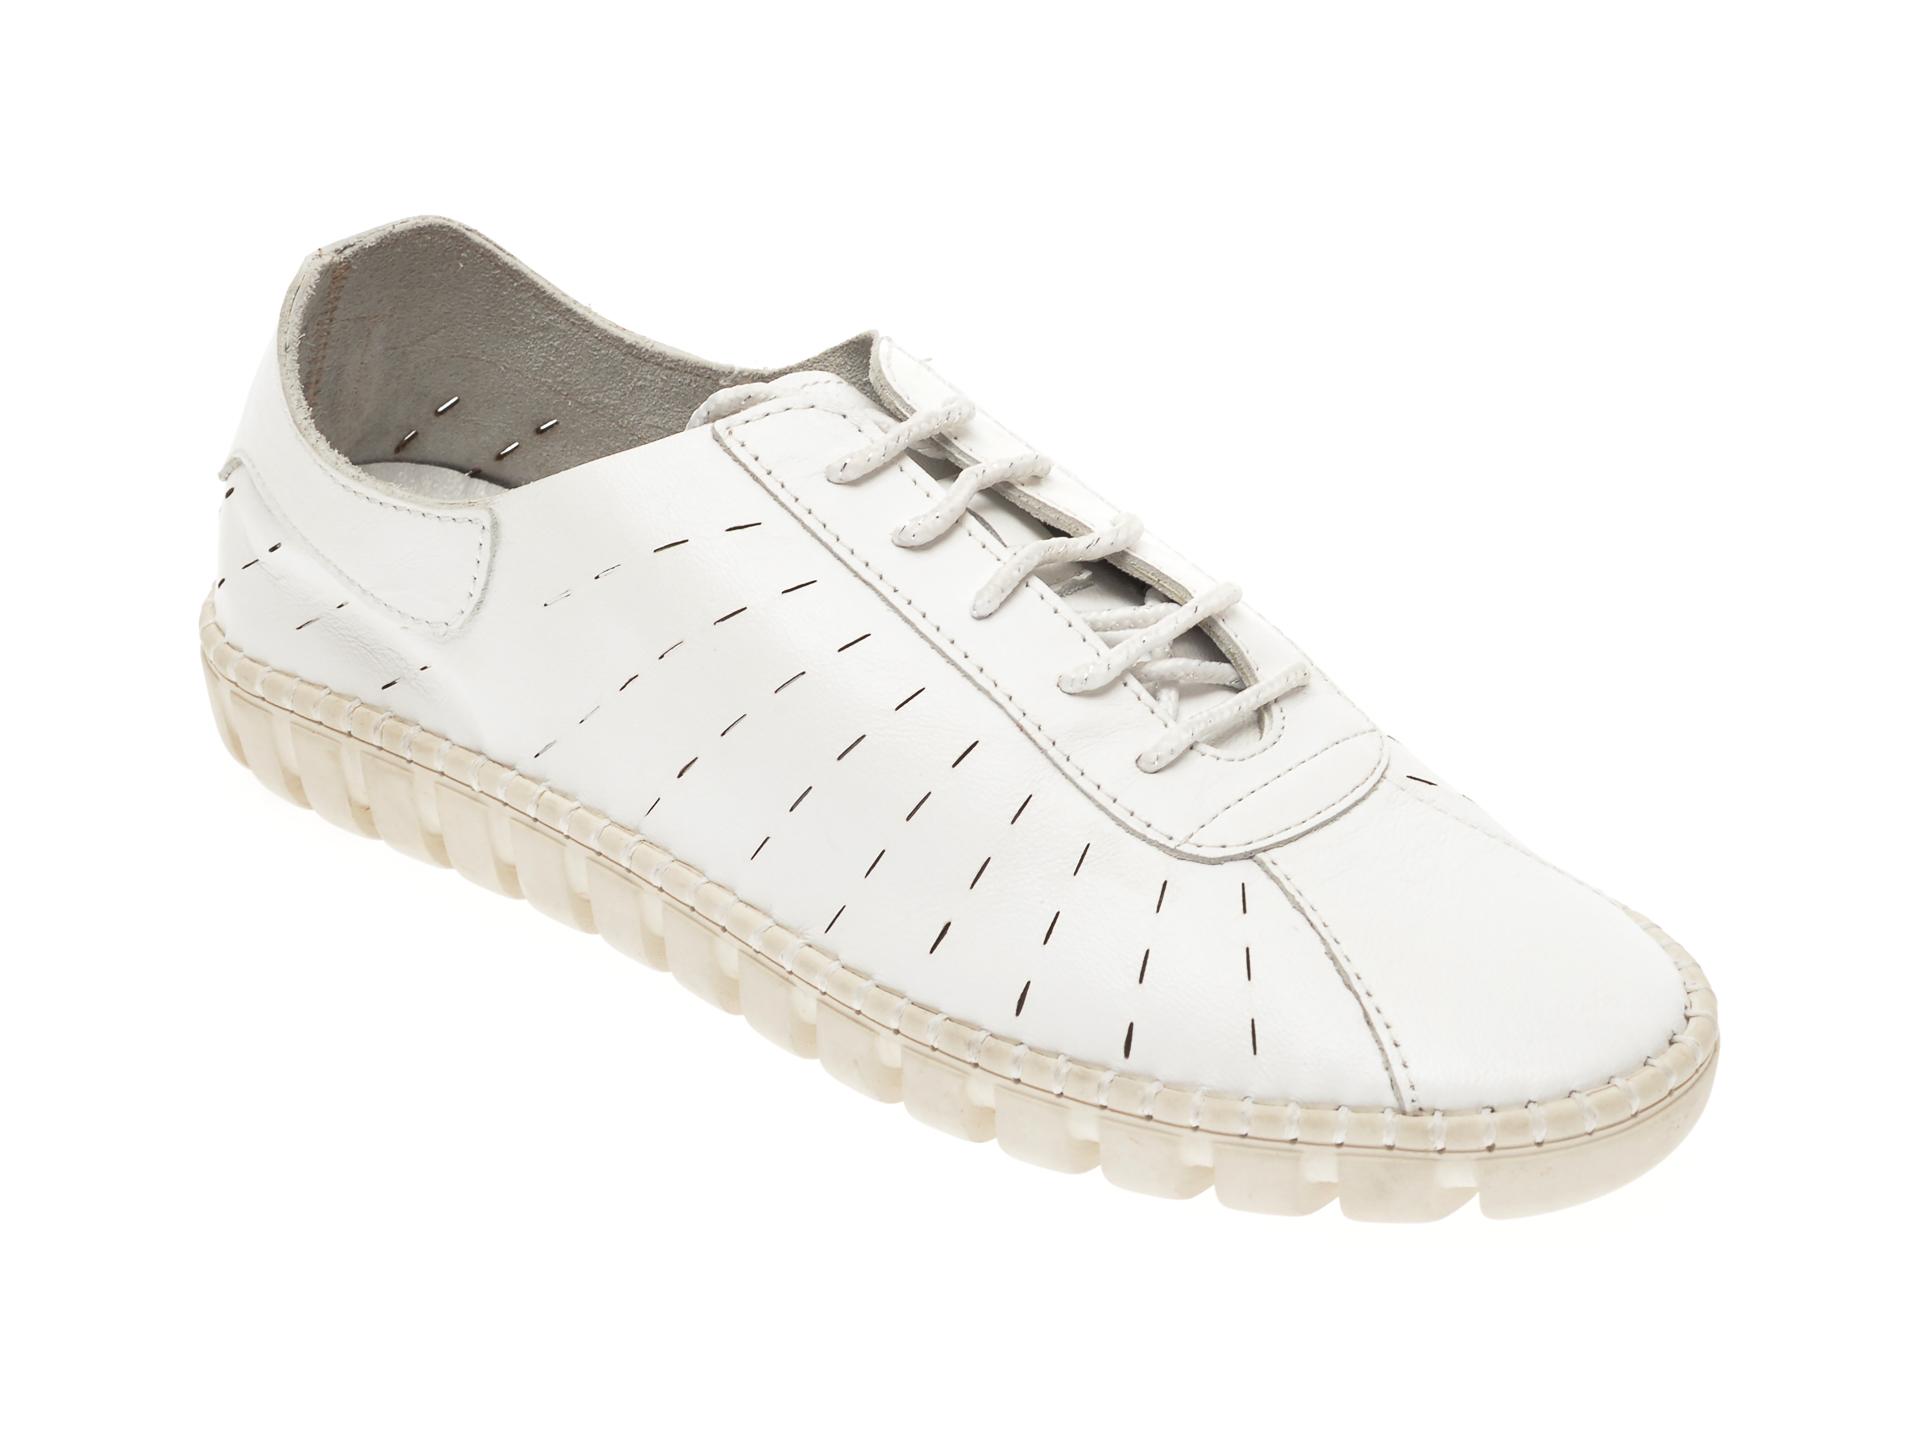 Pantofi PAVARELLA albi, 6020, din piele naturala